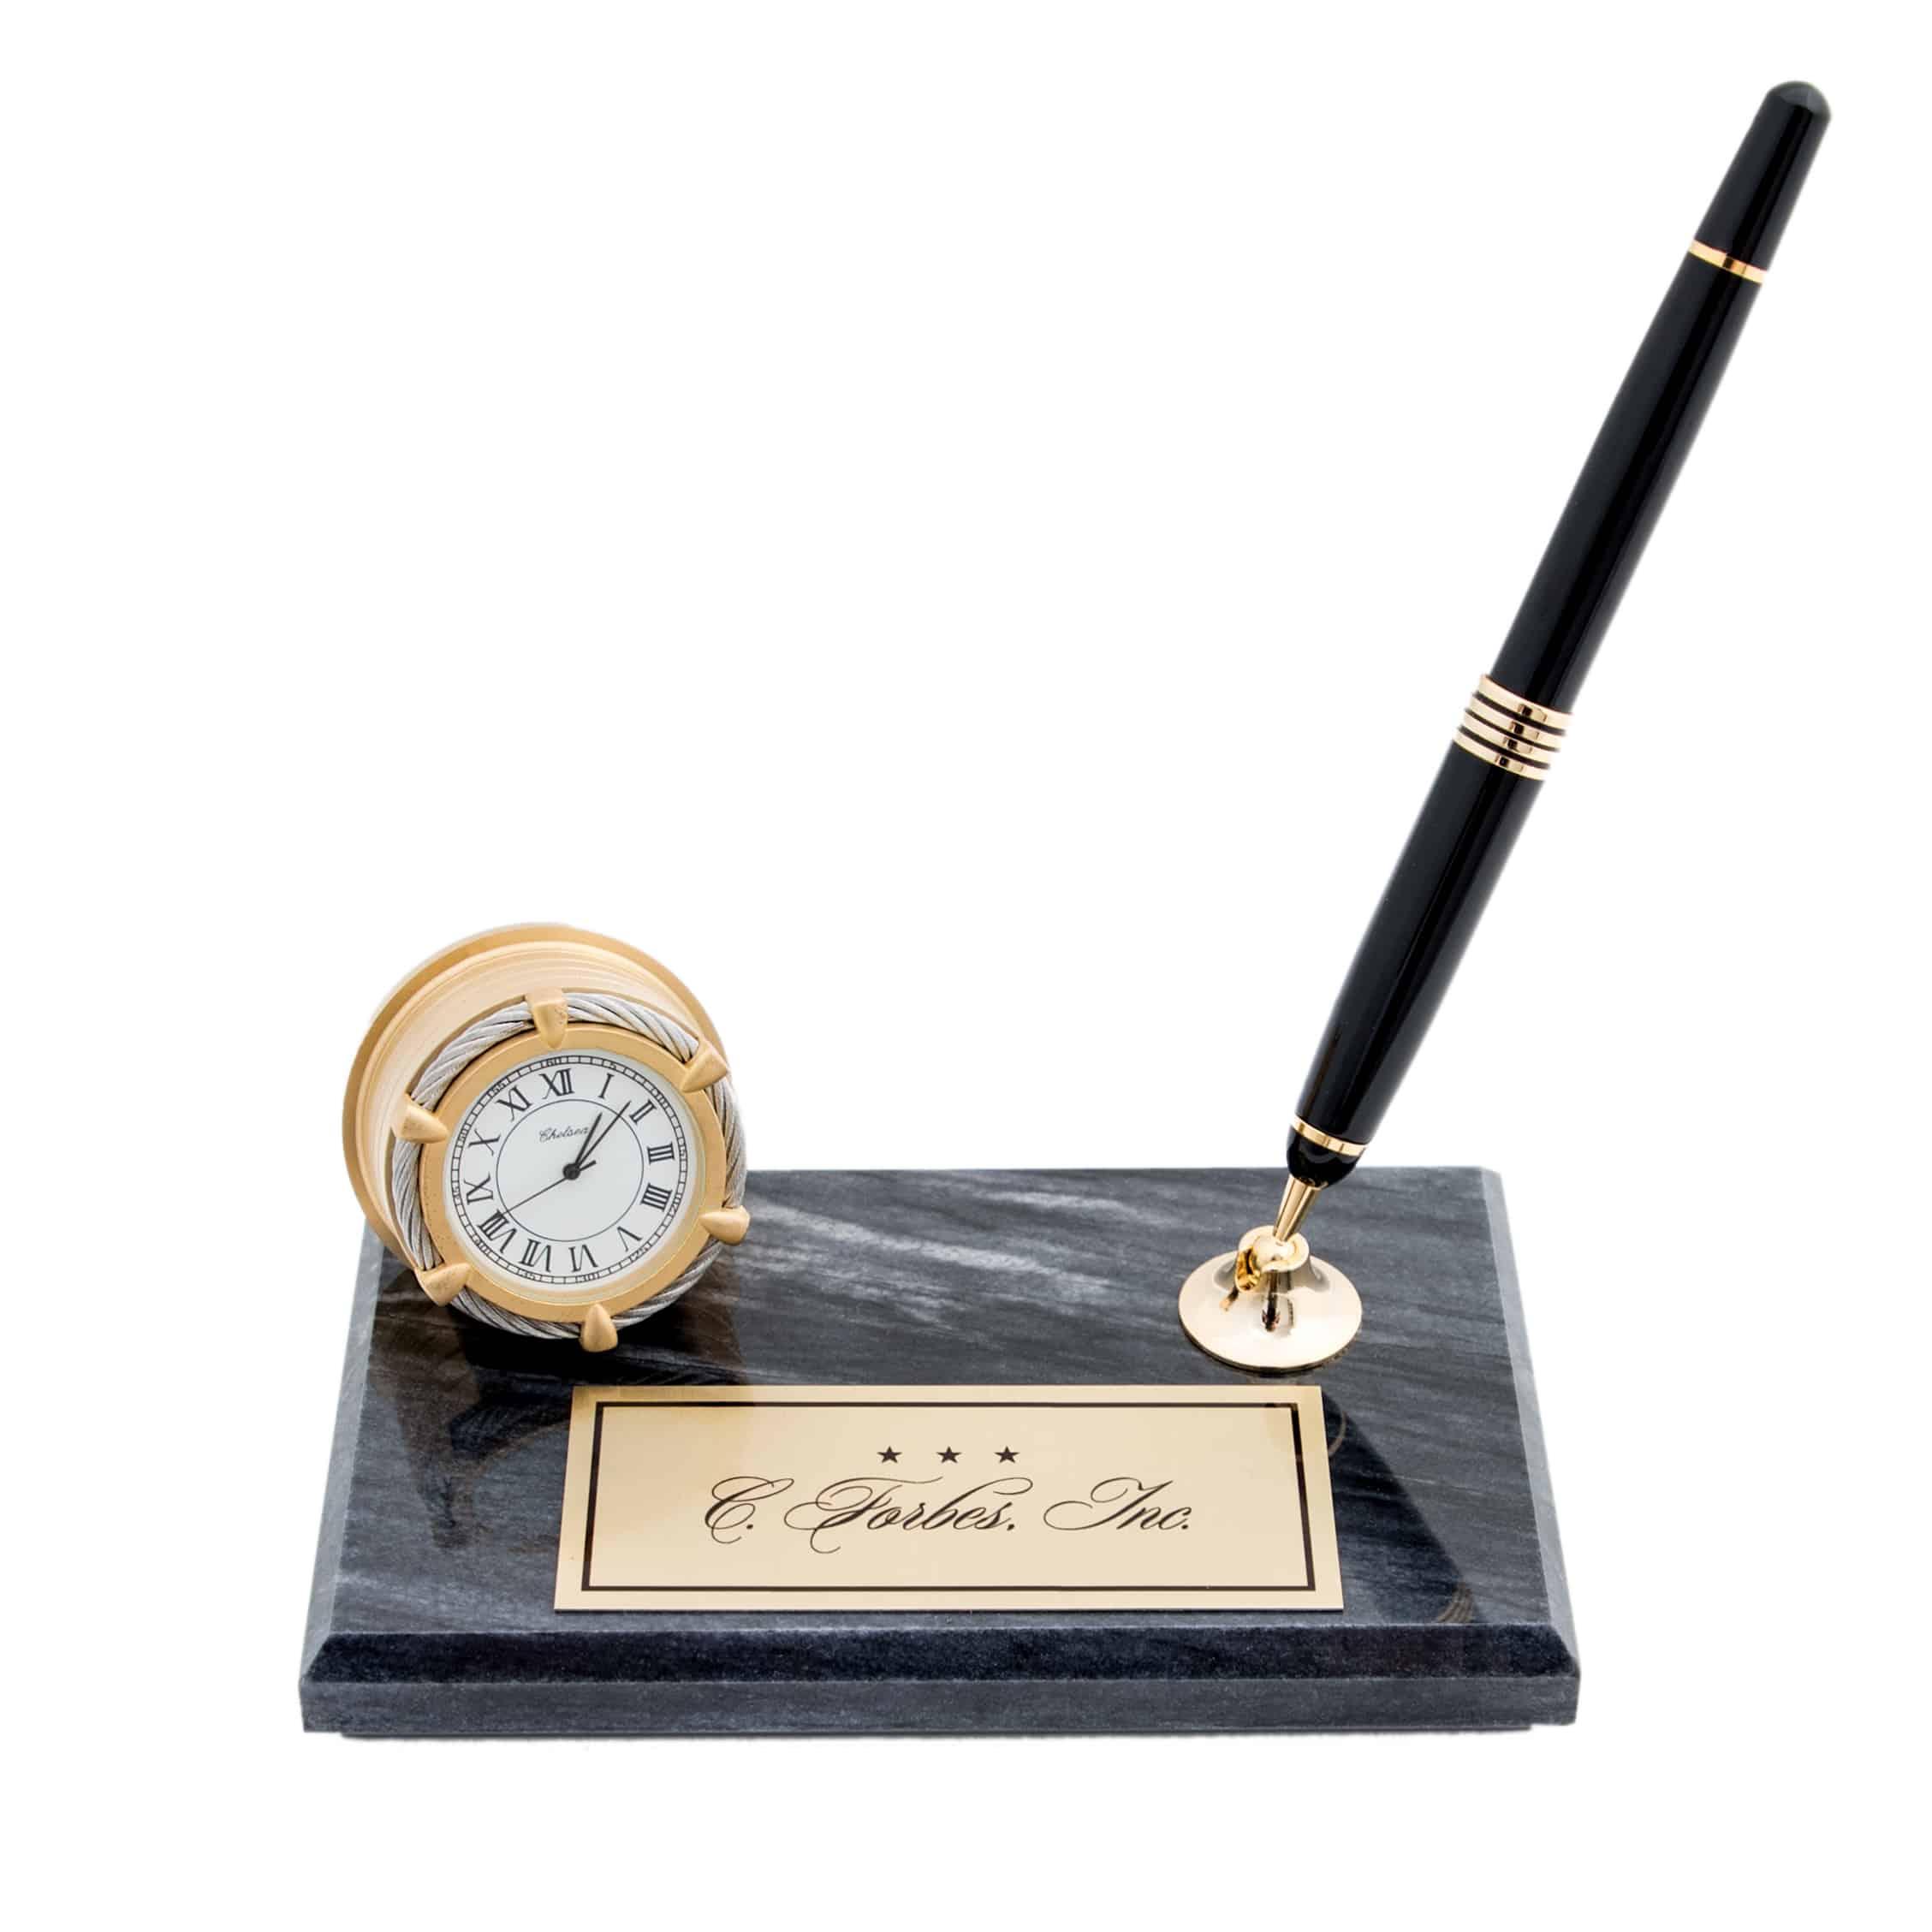 Chelsea Desk Clock And Fountain Pen Custom Brass Plate